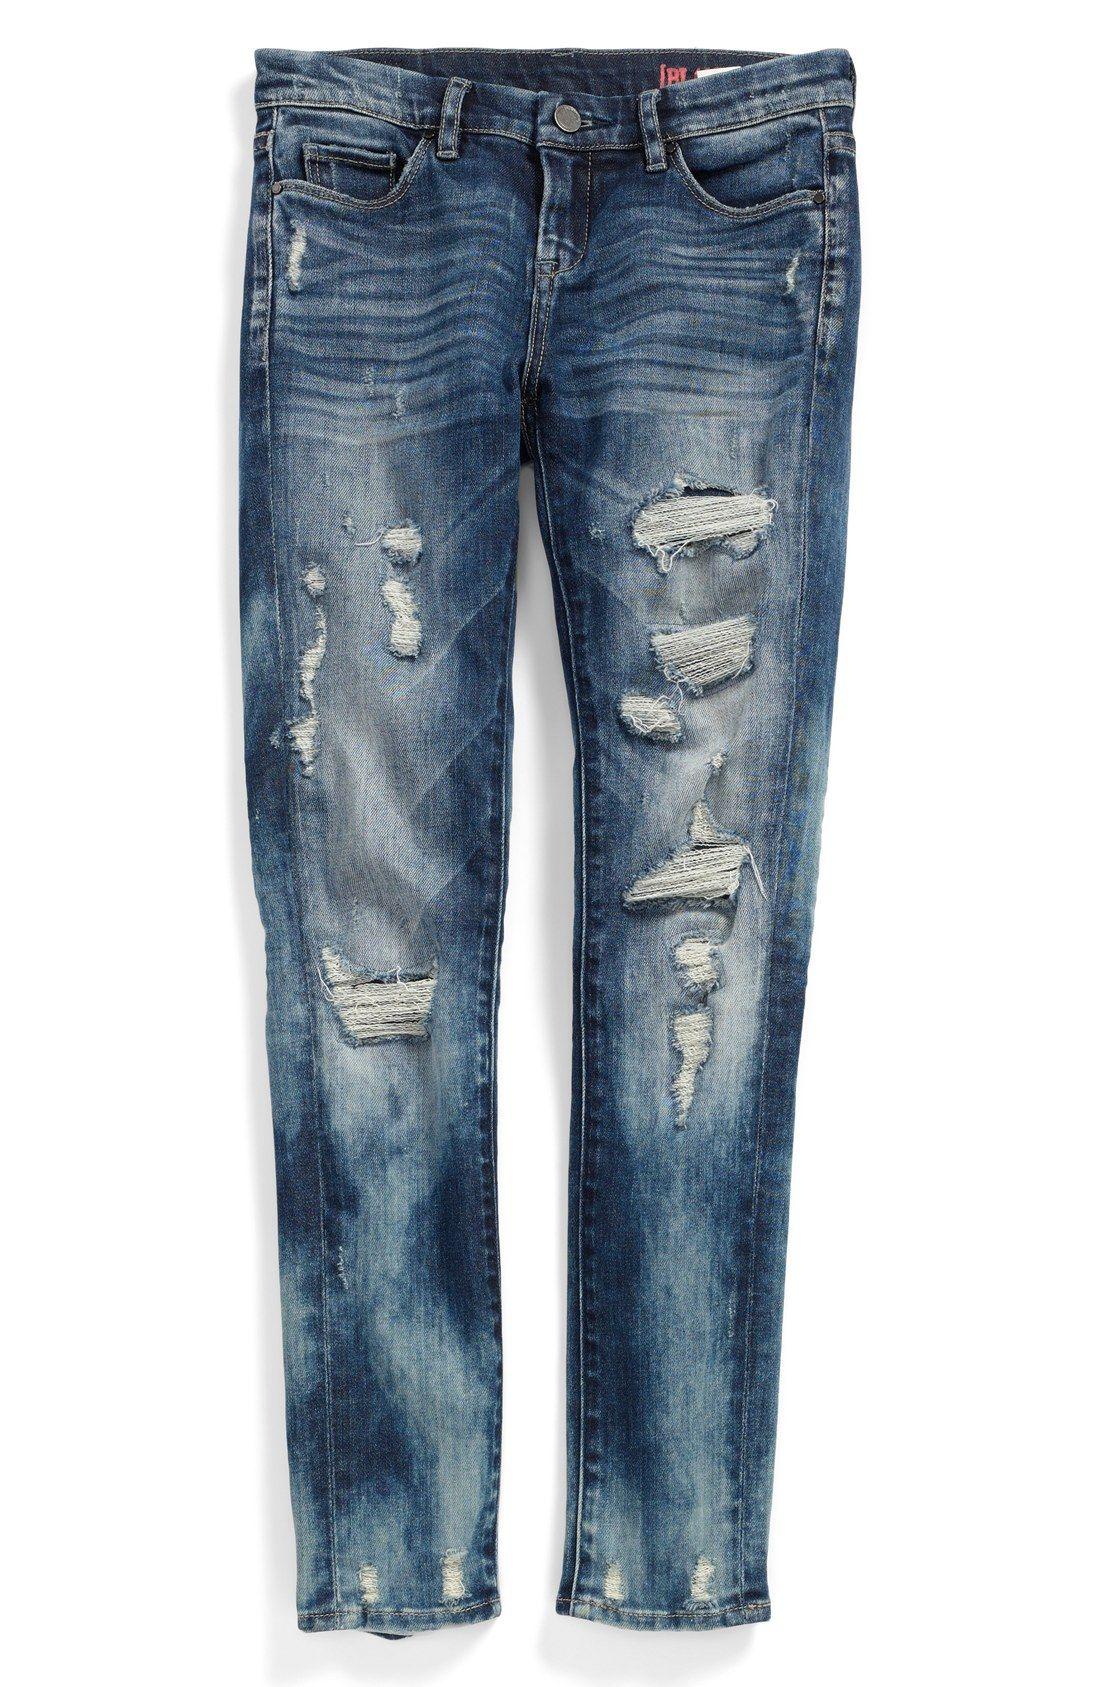 BLANKNYC 'Fit of Rage' Destroyed Jeans (Big Girls)